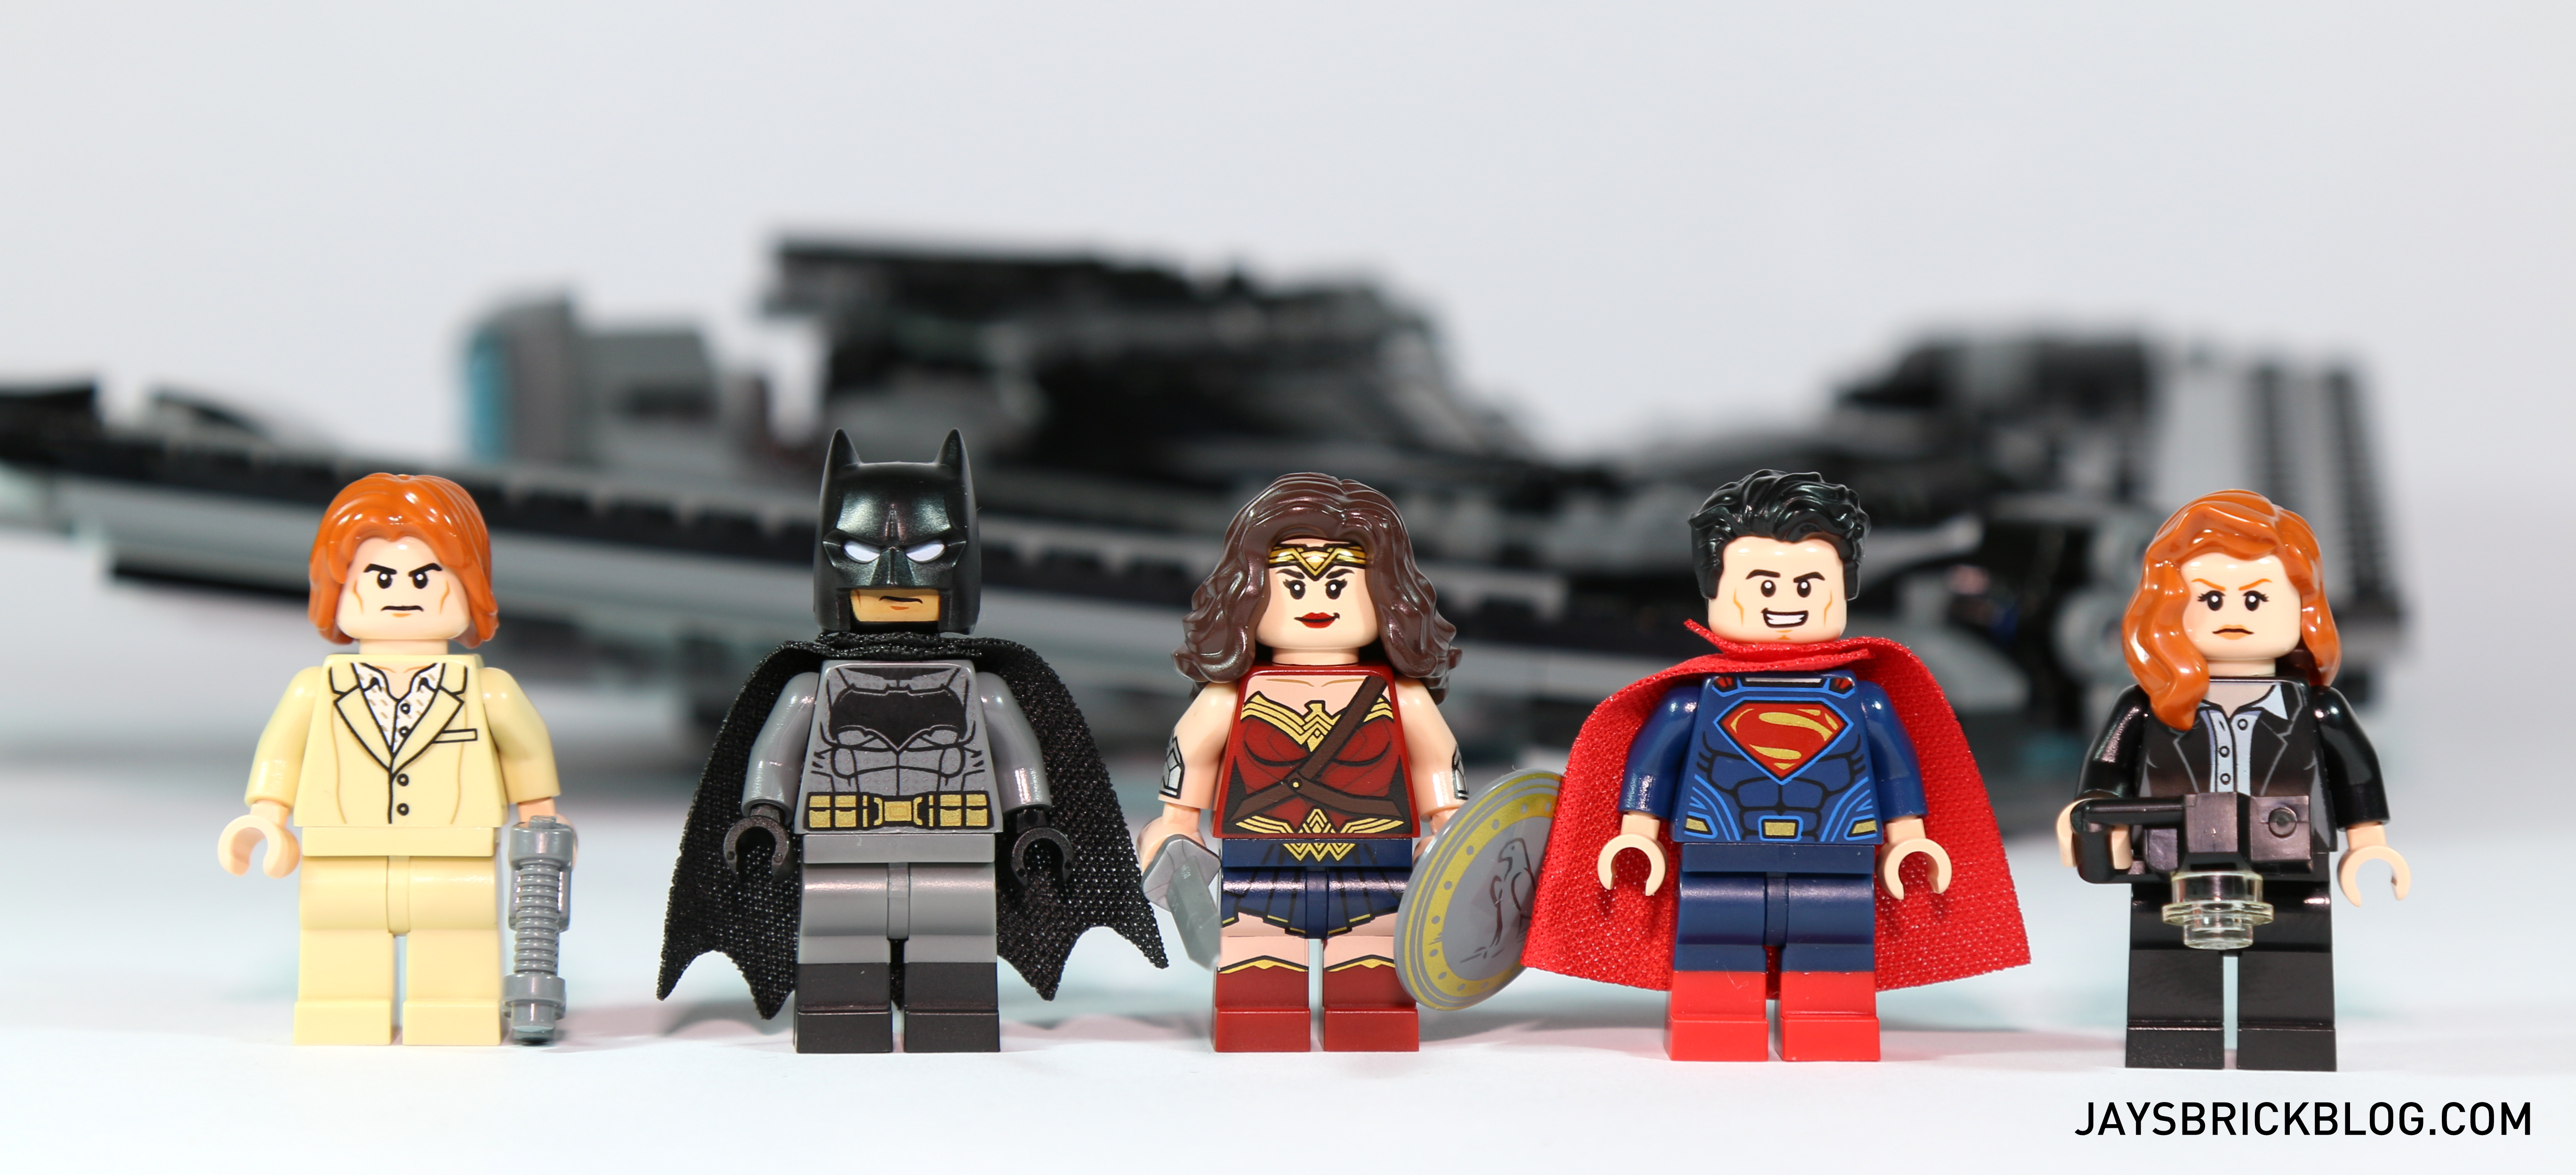 Sky High Battle LEGO 76046 Super Heroes Batman v Superman Heroes of Justice